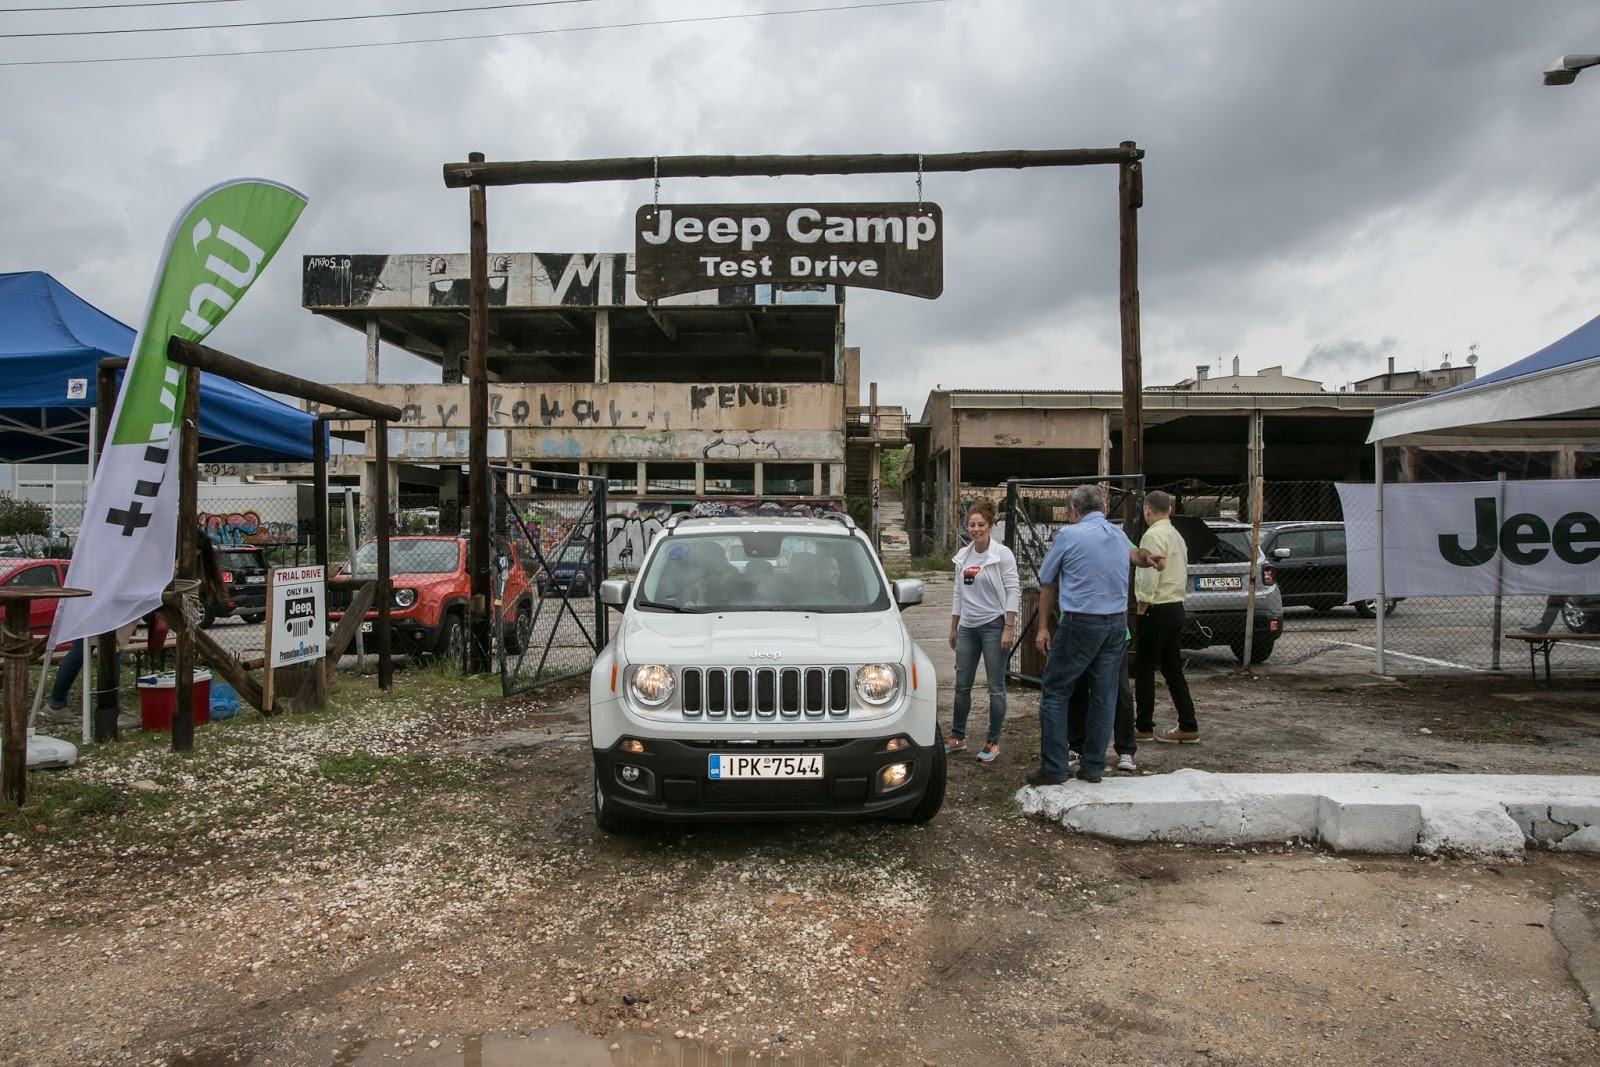 JEEP%2BCAMP GK 0239 Πετάμε ένα Jeep Renegade σε λάσπες, πέτρες, άμμο, λίμνες. Θα τα καταφέρει;